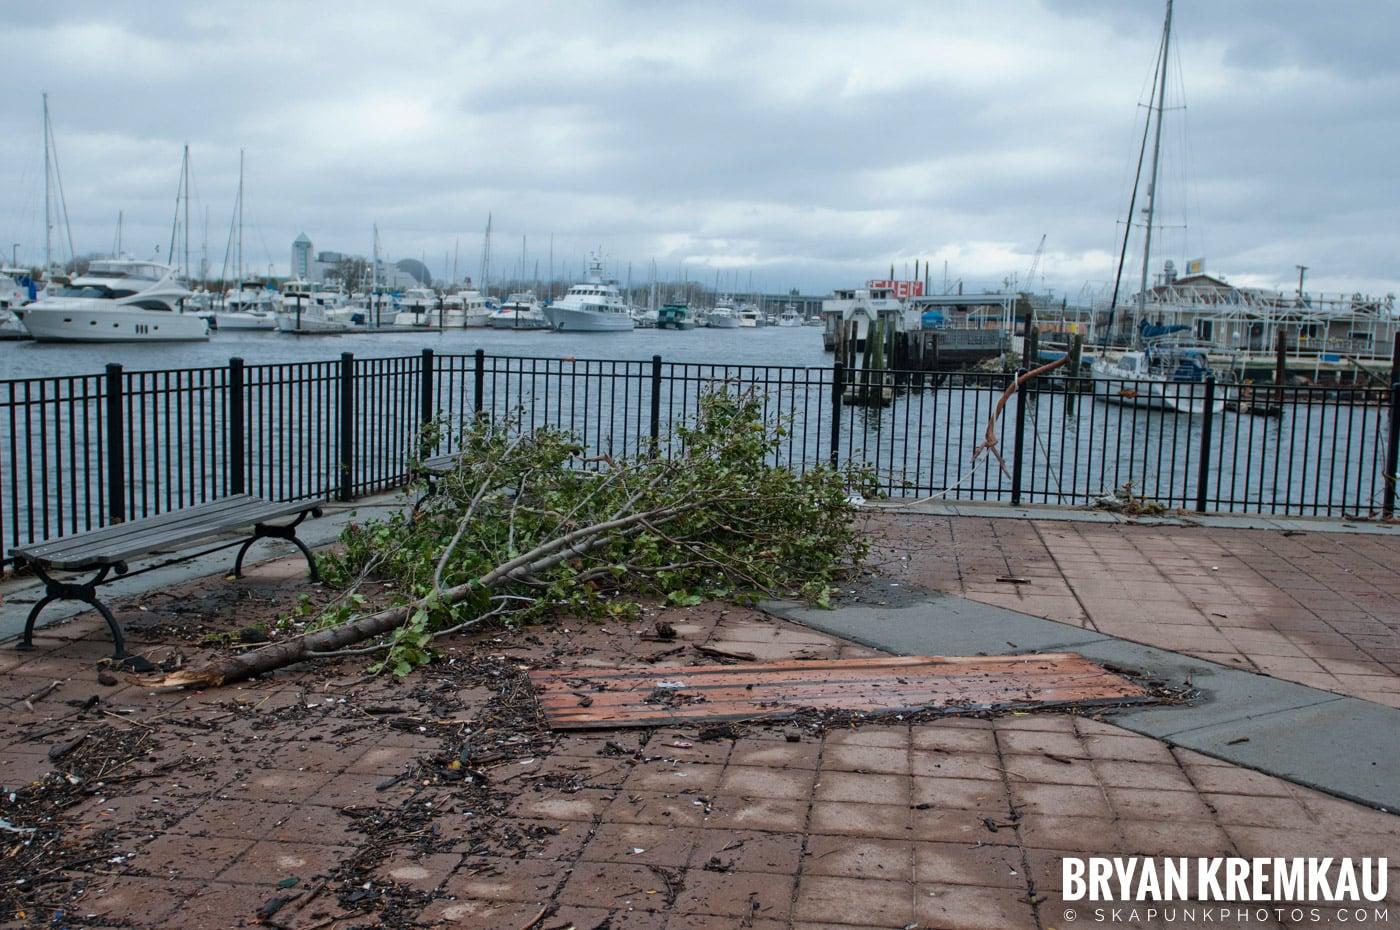 Hurricane Sandy 2012 @ Paulus Hook, Jersey City - 10.29.12 - 10.30.12 (21)